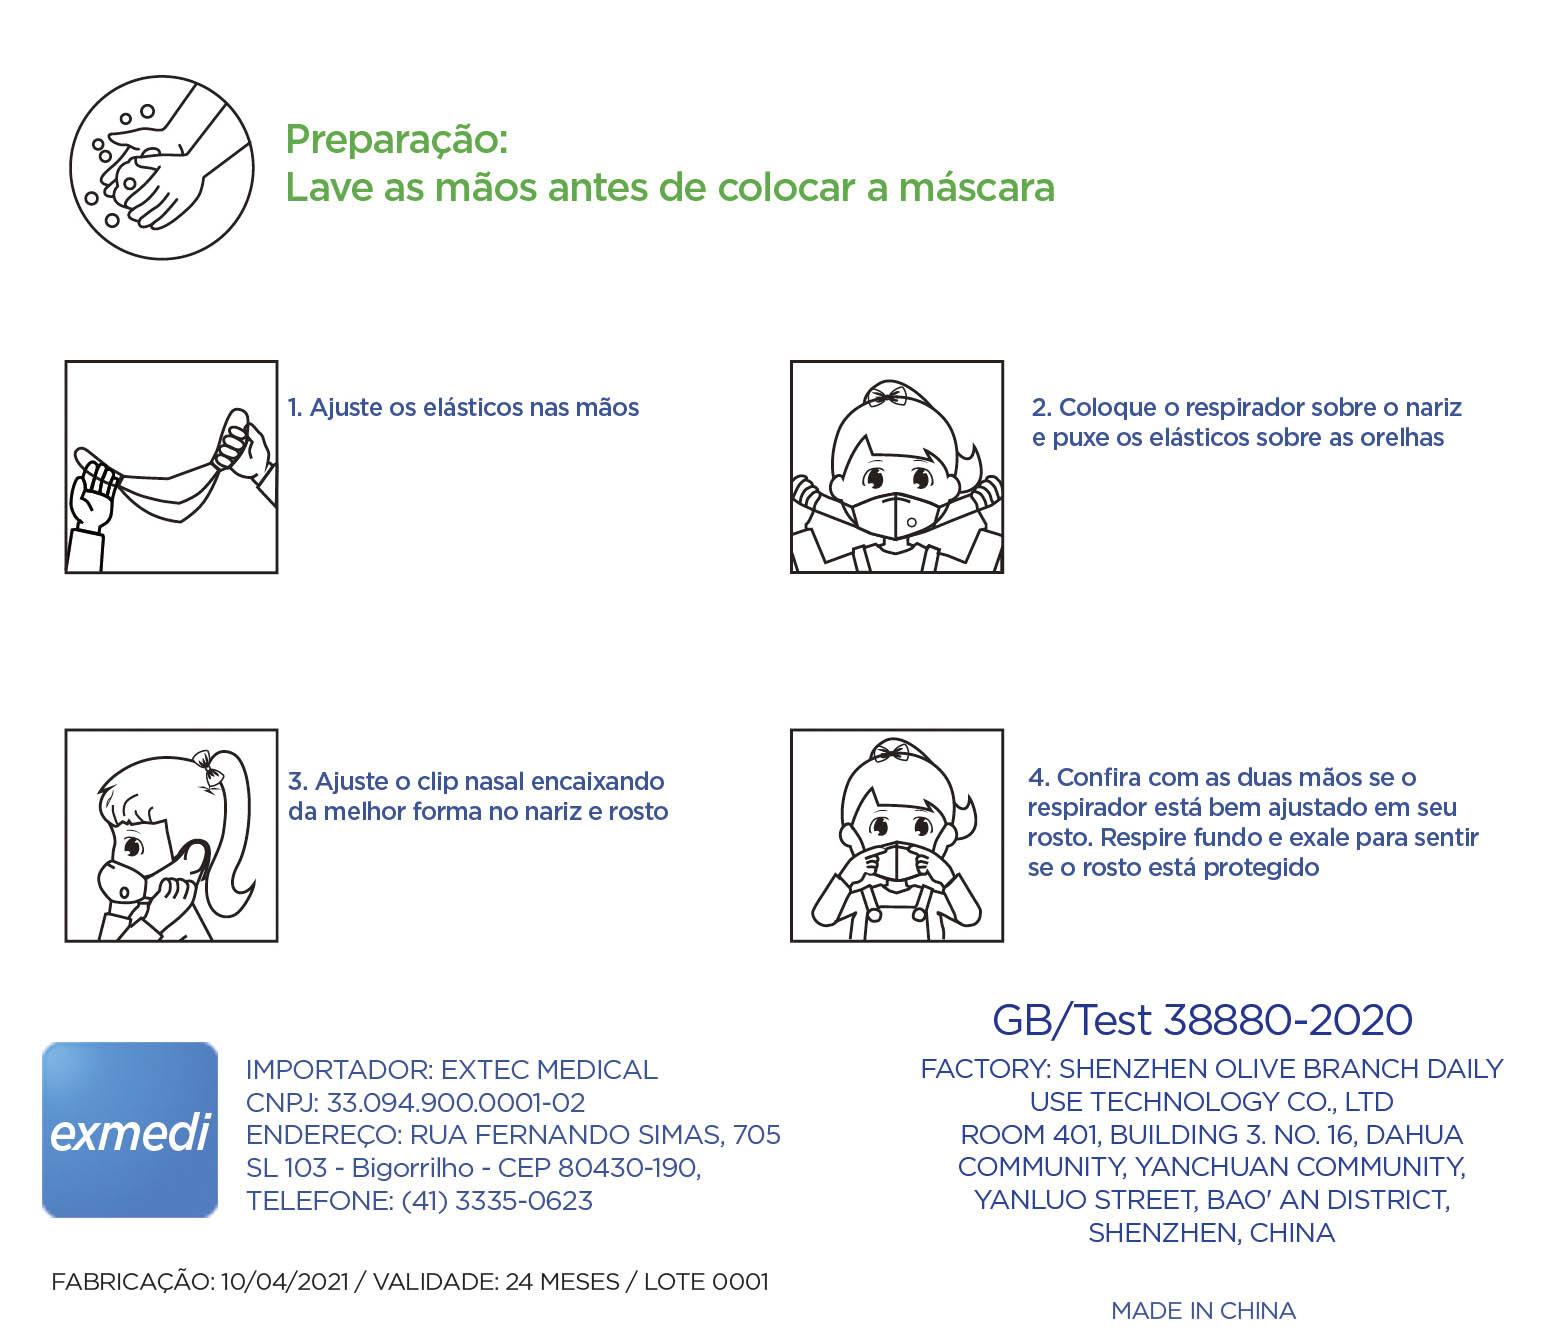 Máscara infantil PFF2 / N95 / KN95 coloridas - 80 unidades 5 camadas dupla camada de meltblow BFE 98% +  tnt spunbond hospitalar hipoalergenico